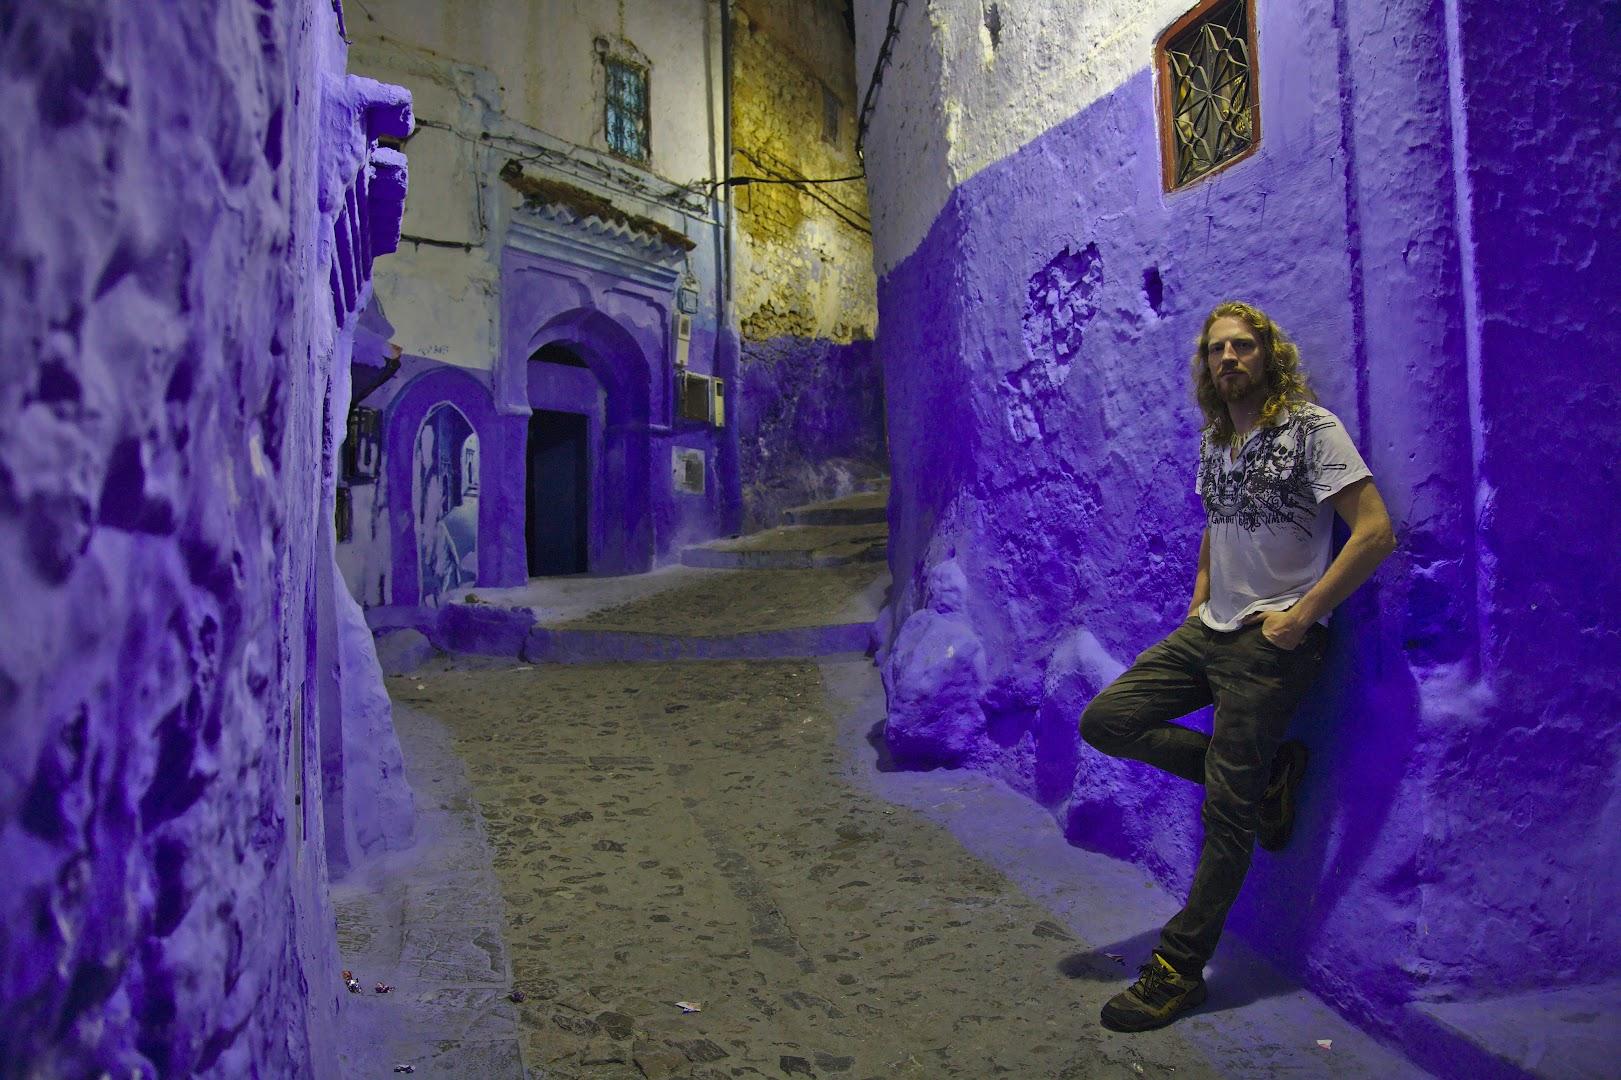 By night the Blue City looks purple